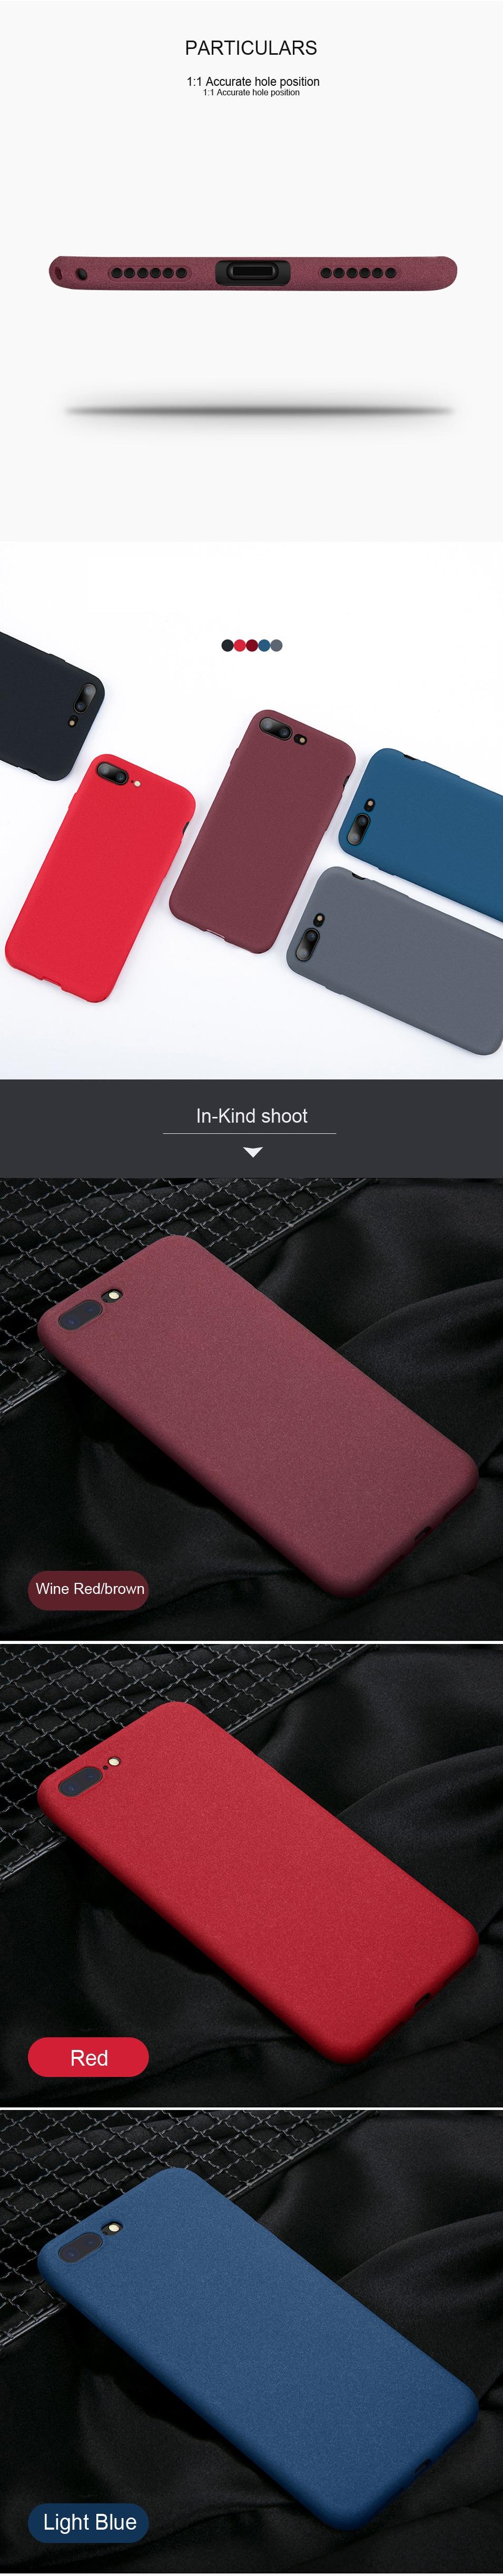 S10 Soft Silicone Matte Plain Protective Cover Neat Phone Case For Samsung Galaxy A50 A10 A30 A40 A60 A70 A80 A90 Bumper (19)